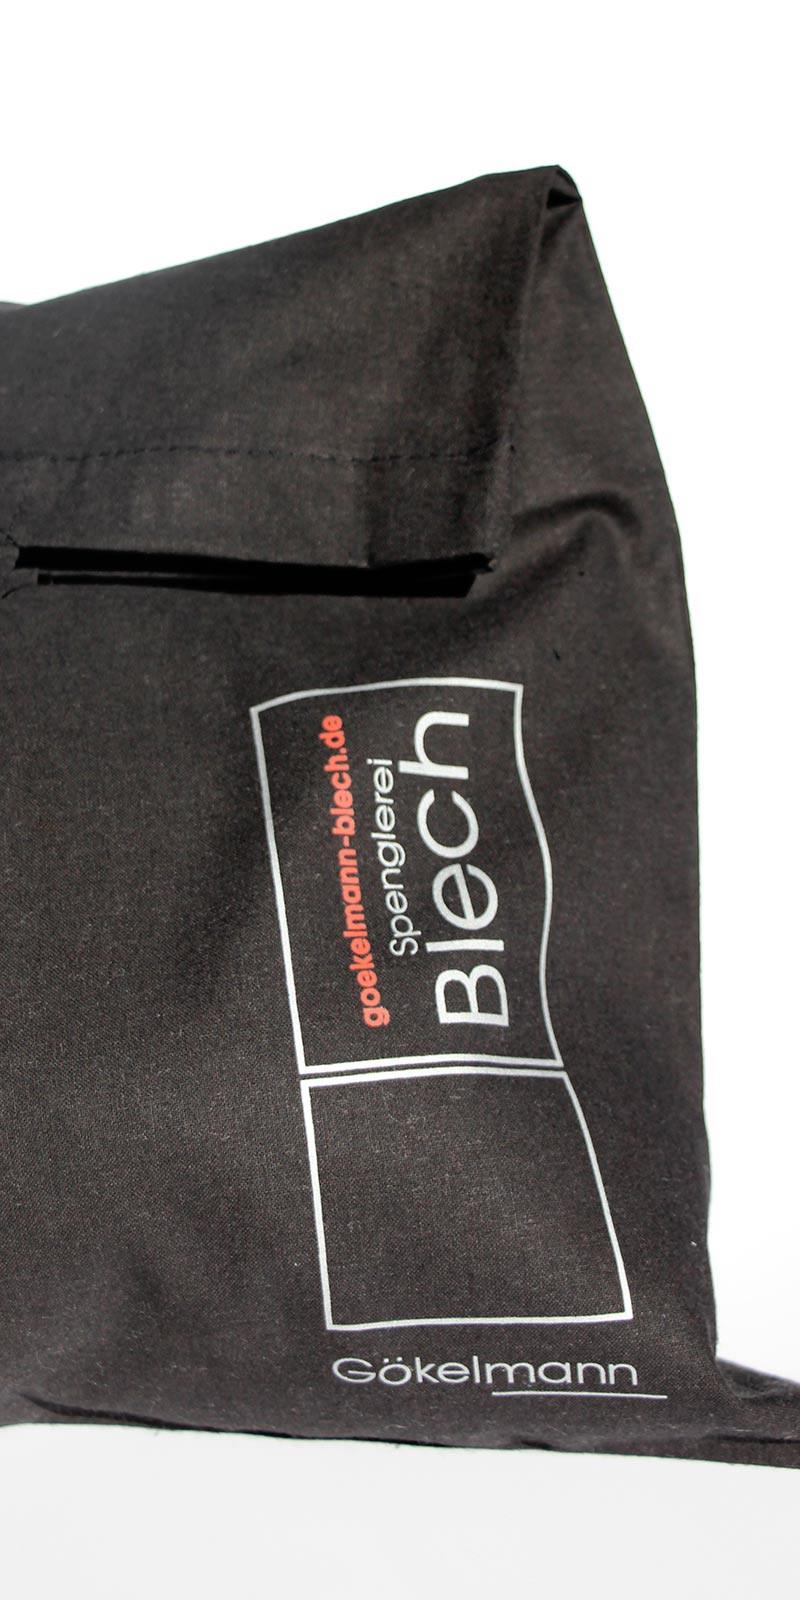 Stofftaschen – individuell bedruckt